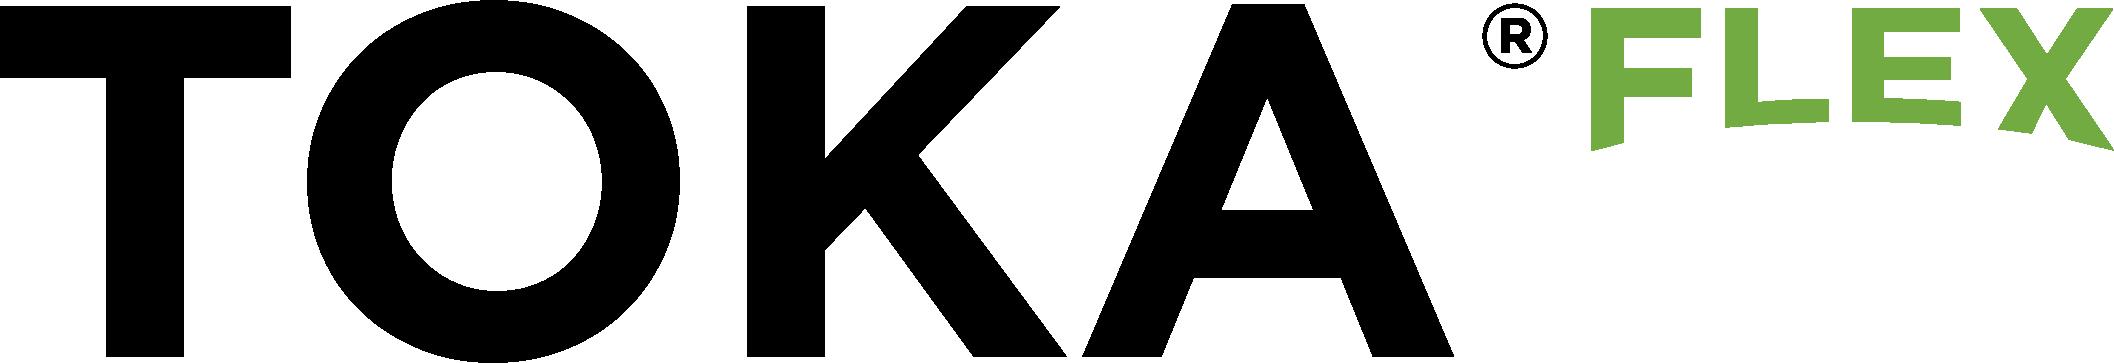 TOKA FLEX_Registered Logo_Color